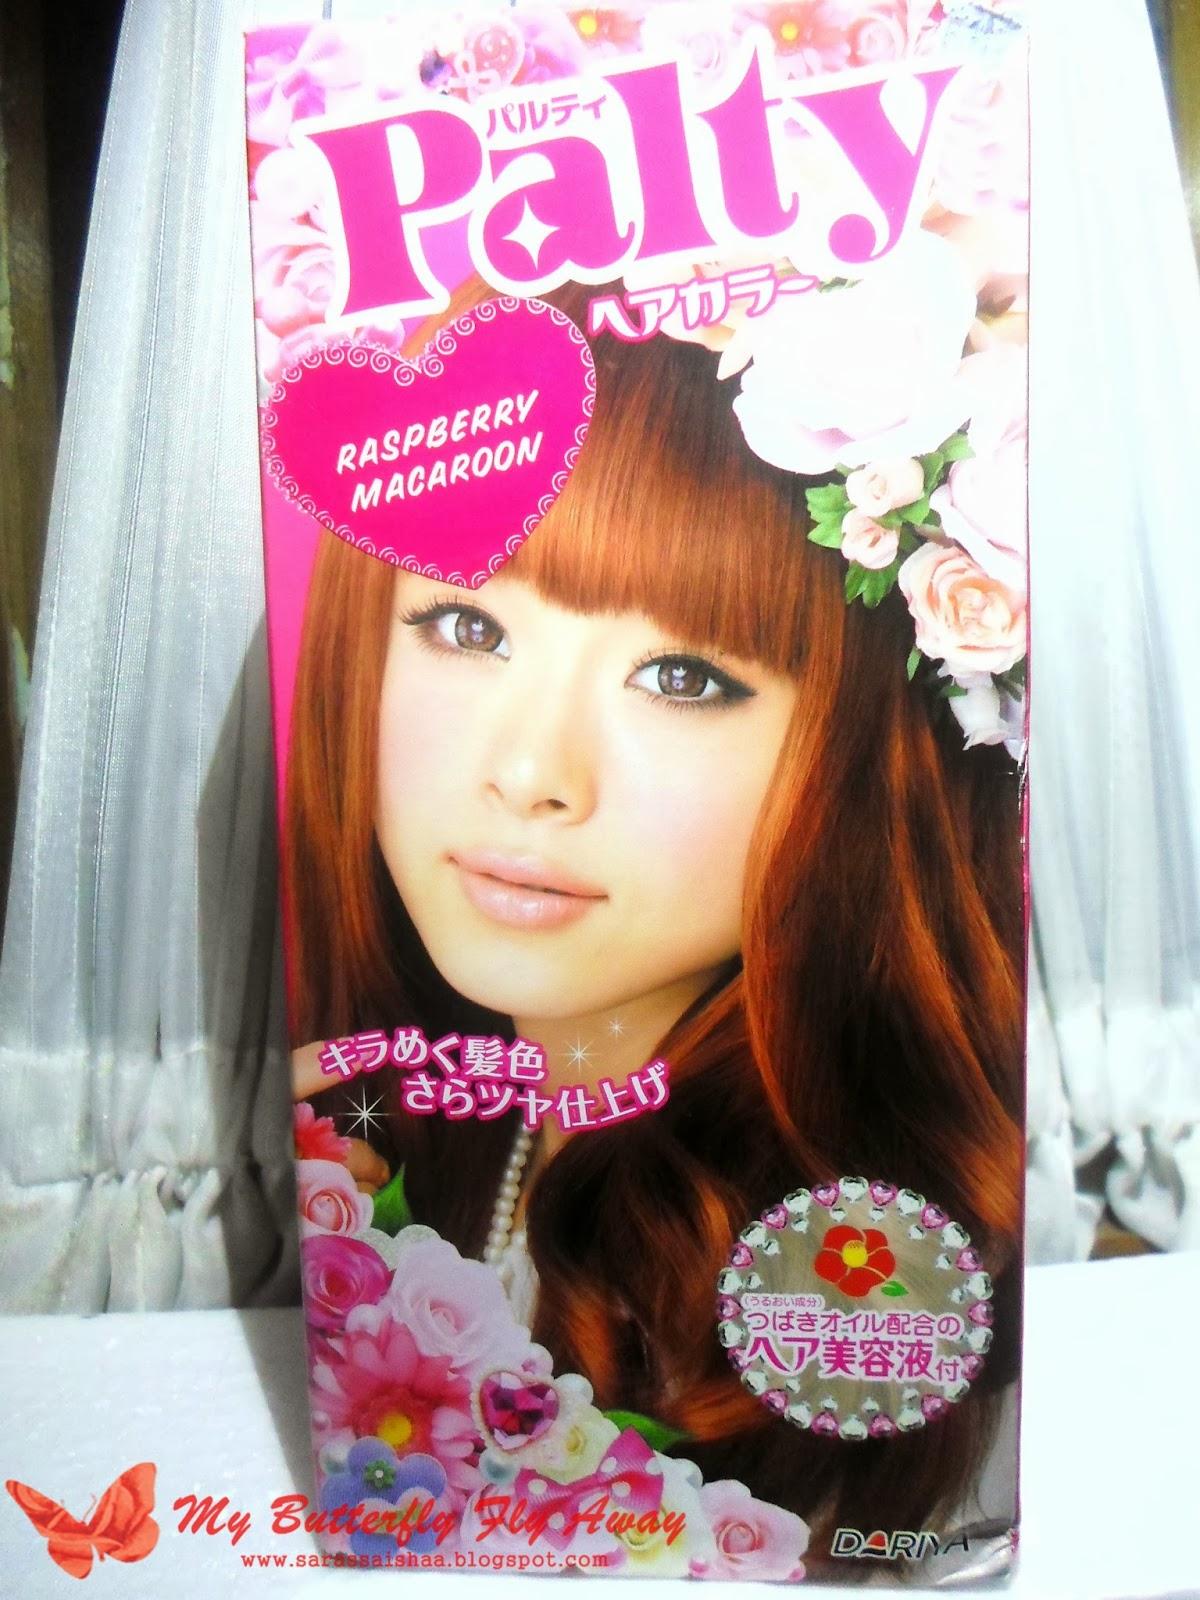 Palty jelly hair color english instructions best hair color kawaii beauty palty hair dye by dariya philippines nvjuhfo Choice Image